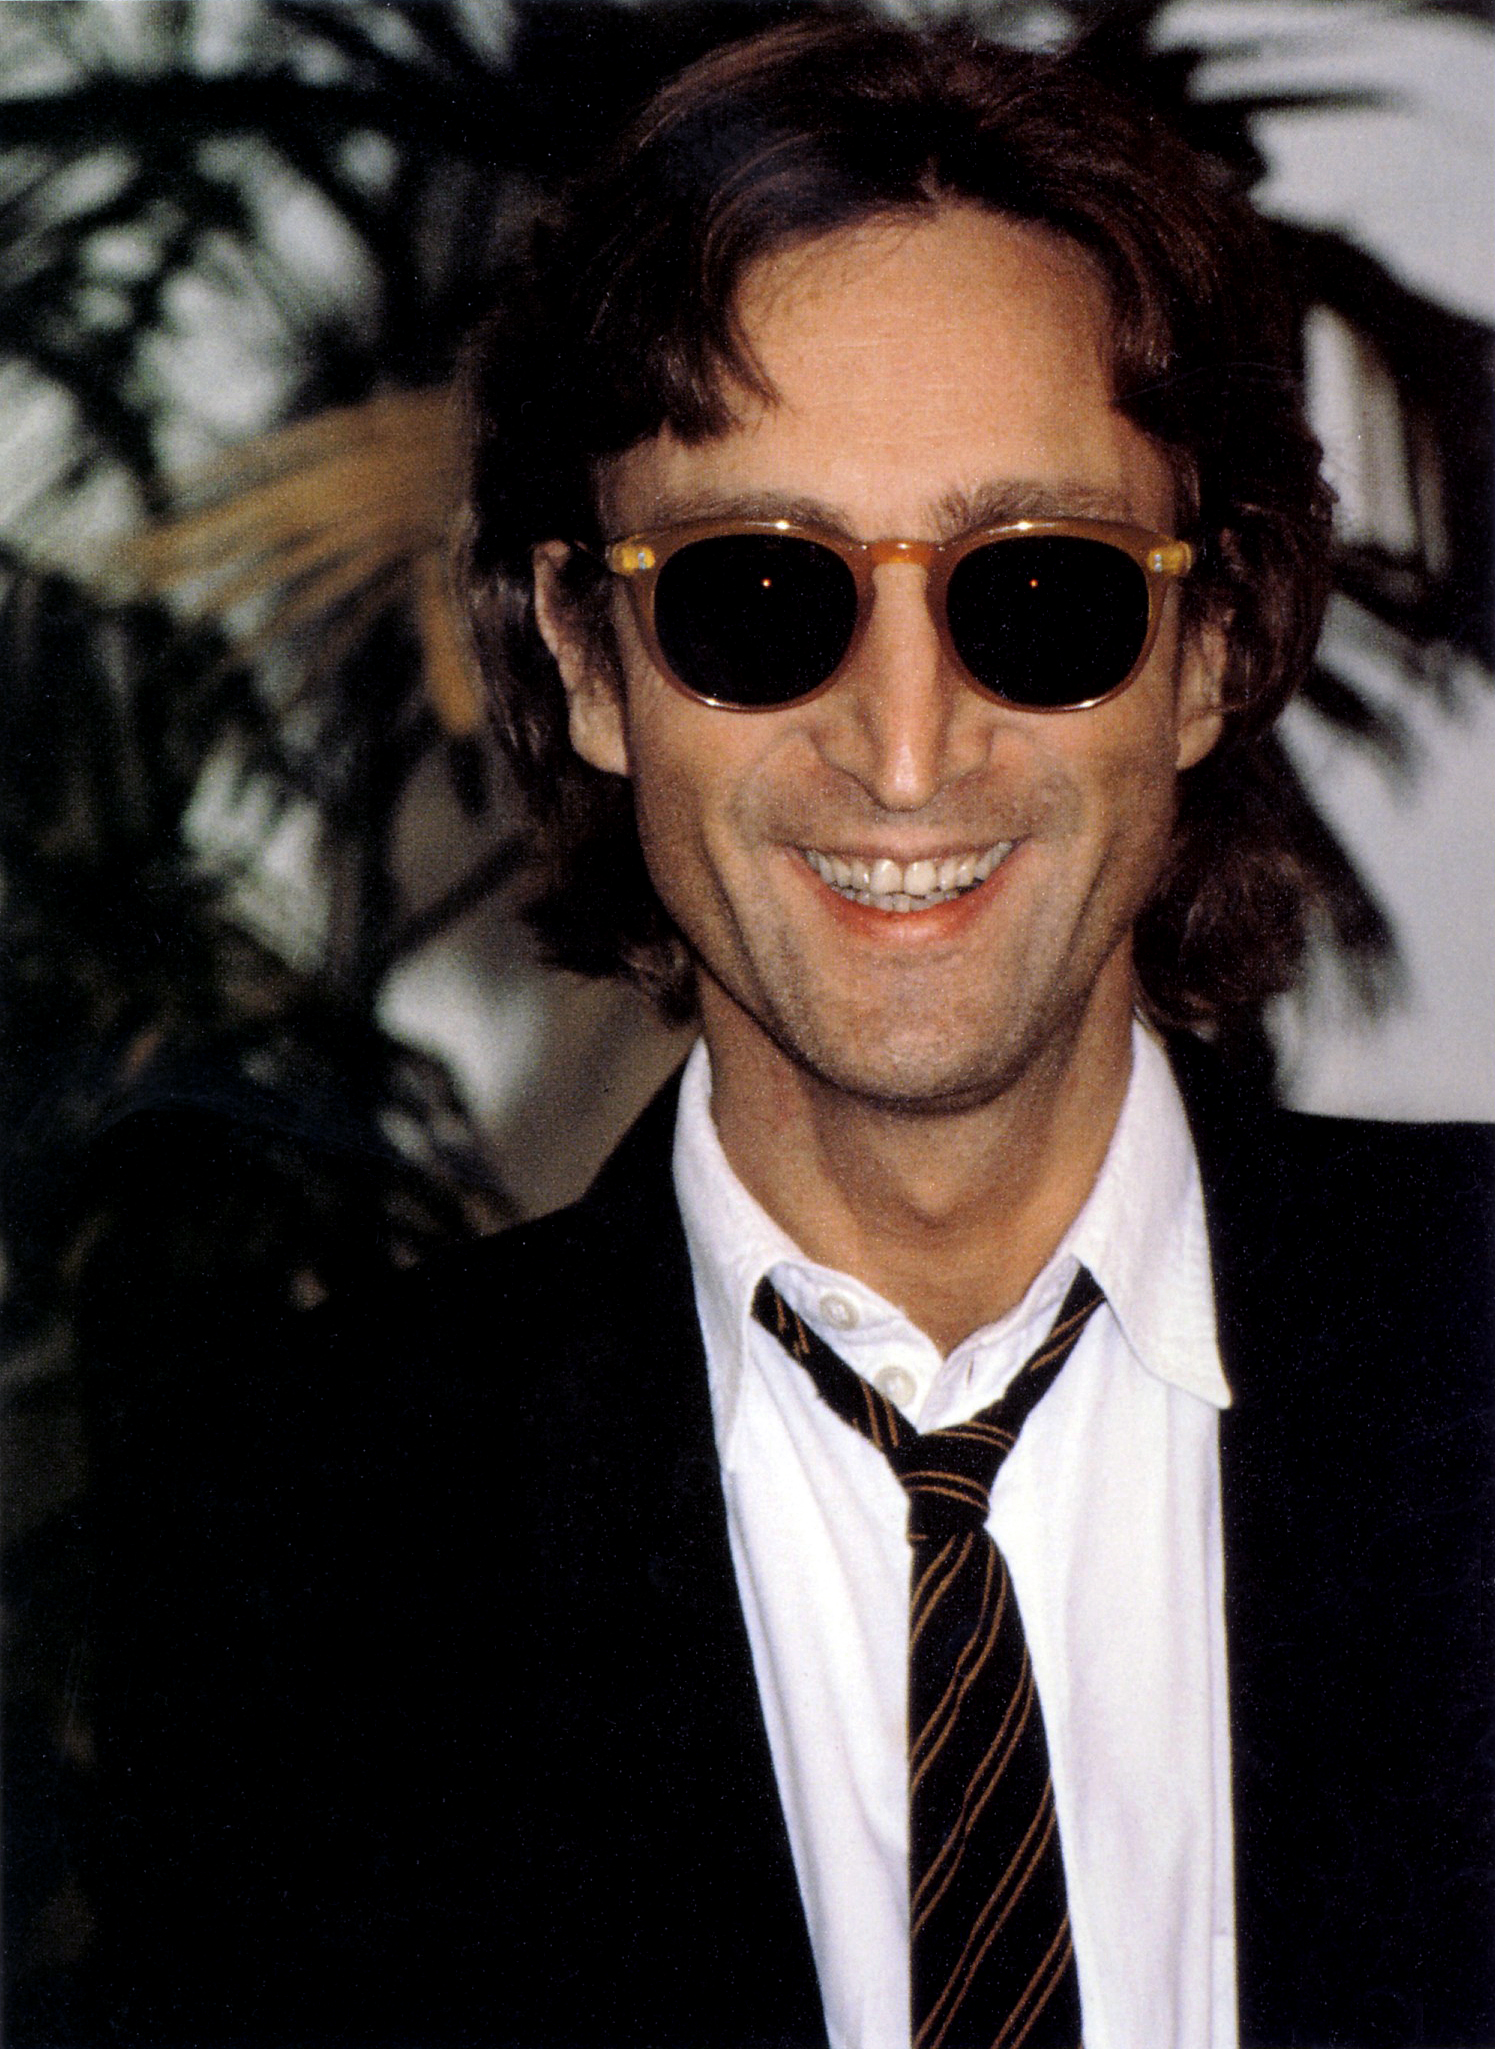 John Lennon The Beatles Wiki Fandom